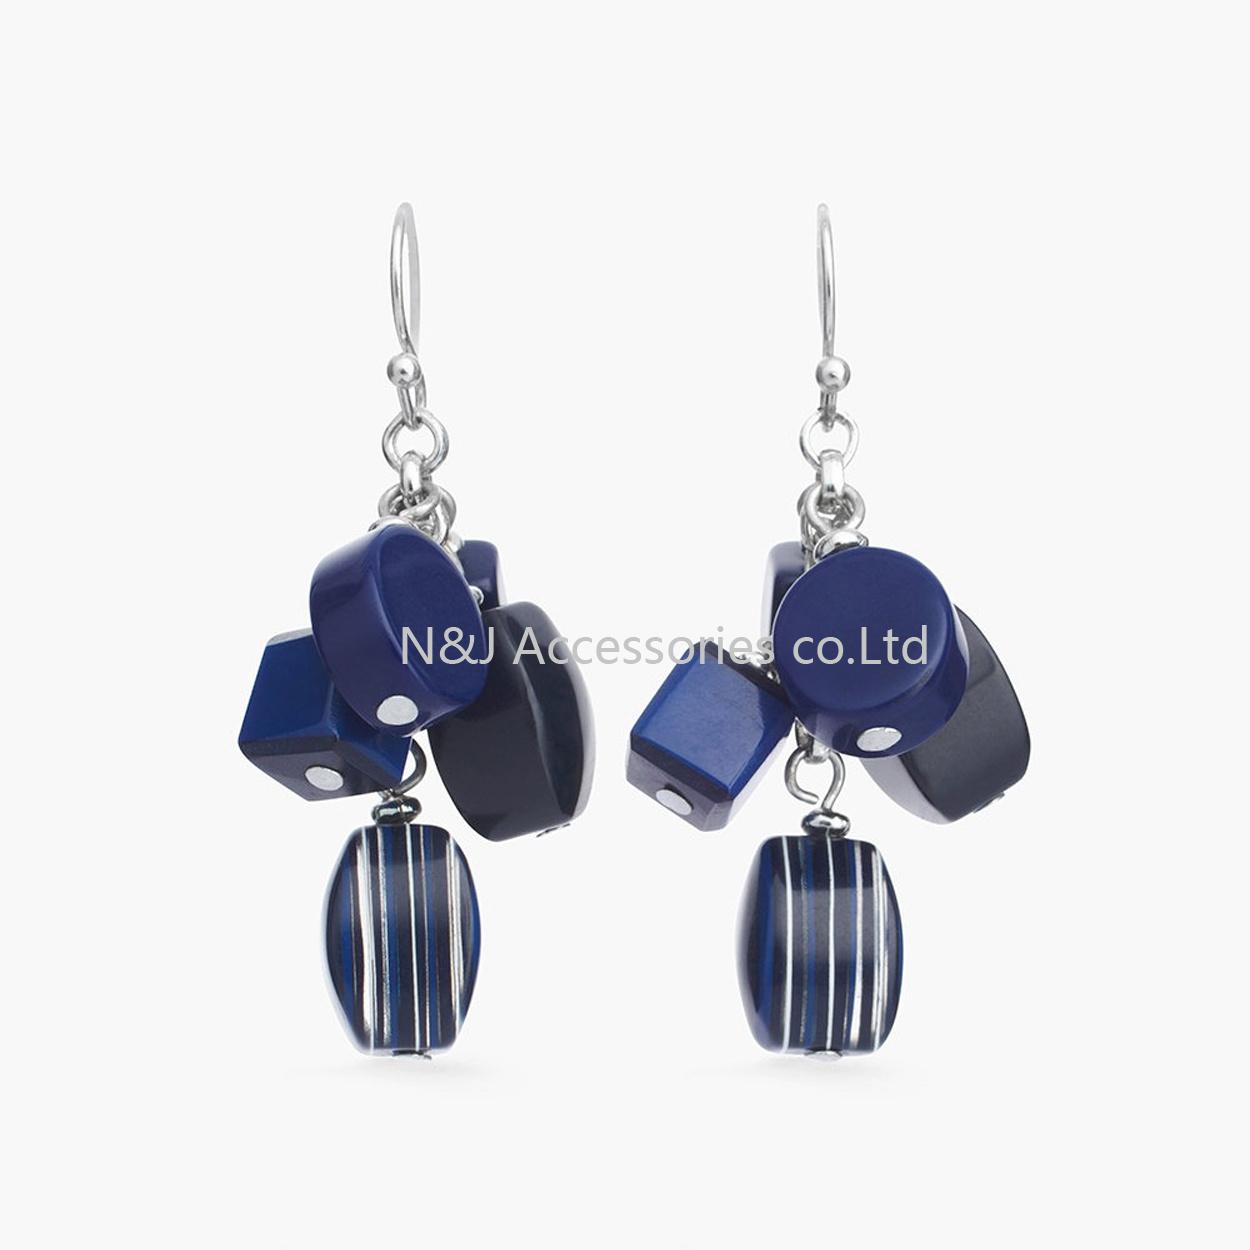 Women Vintage Hollow Drop Earrings Jewelry Antique Silver Acrylic Blue Beads Round Pendant Dangle Earrings